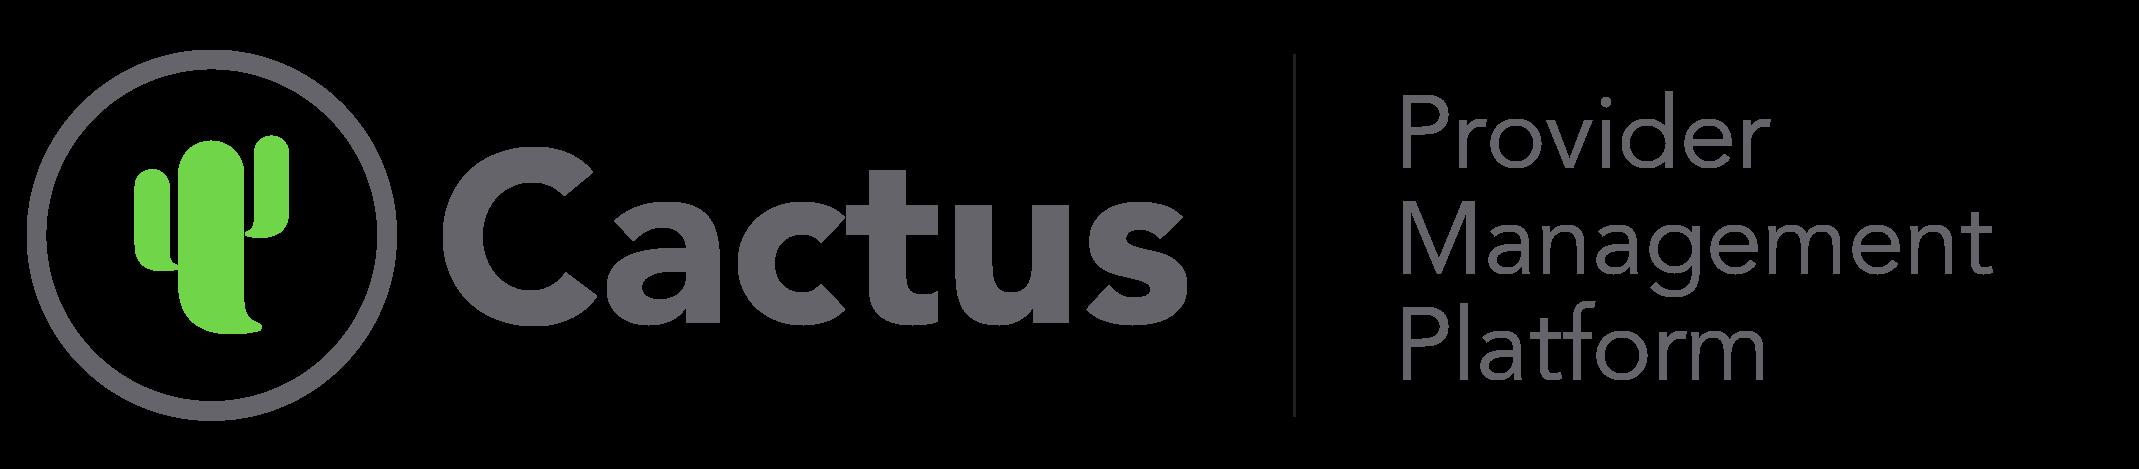 Cactus logo-1.png